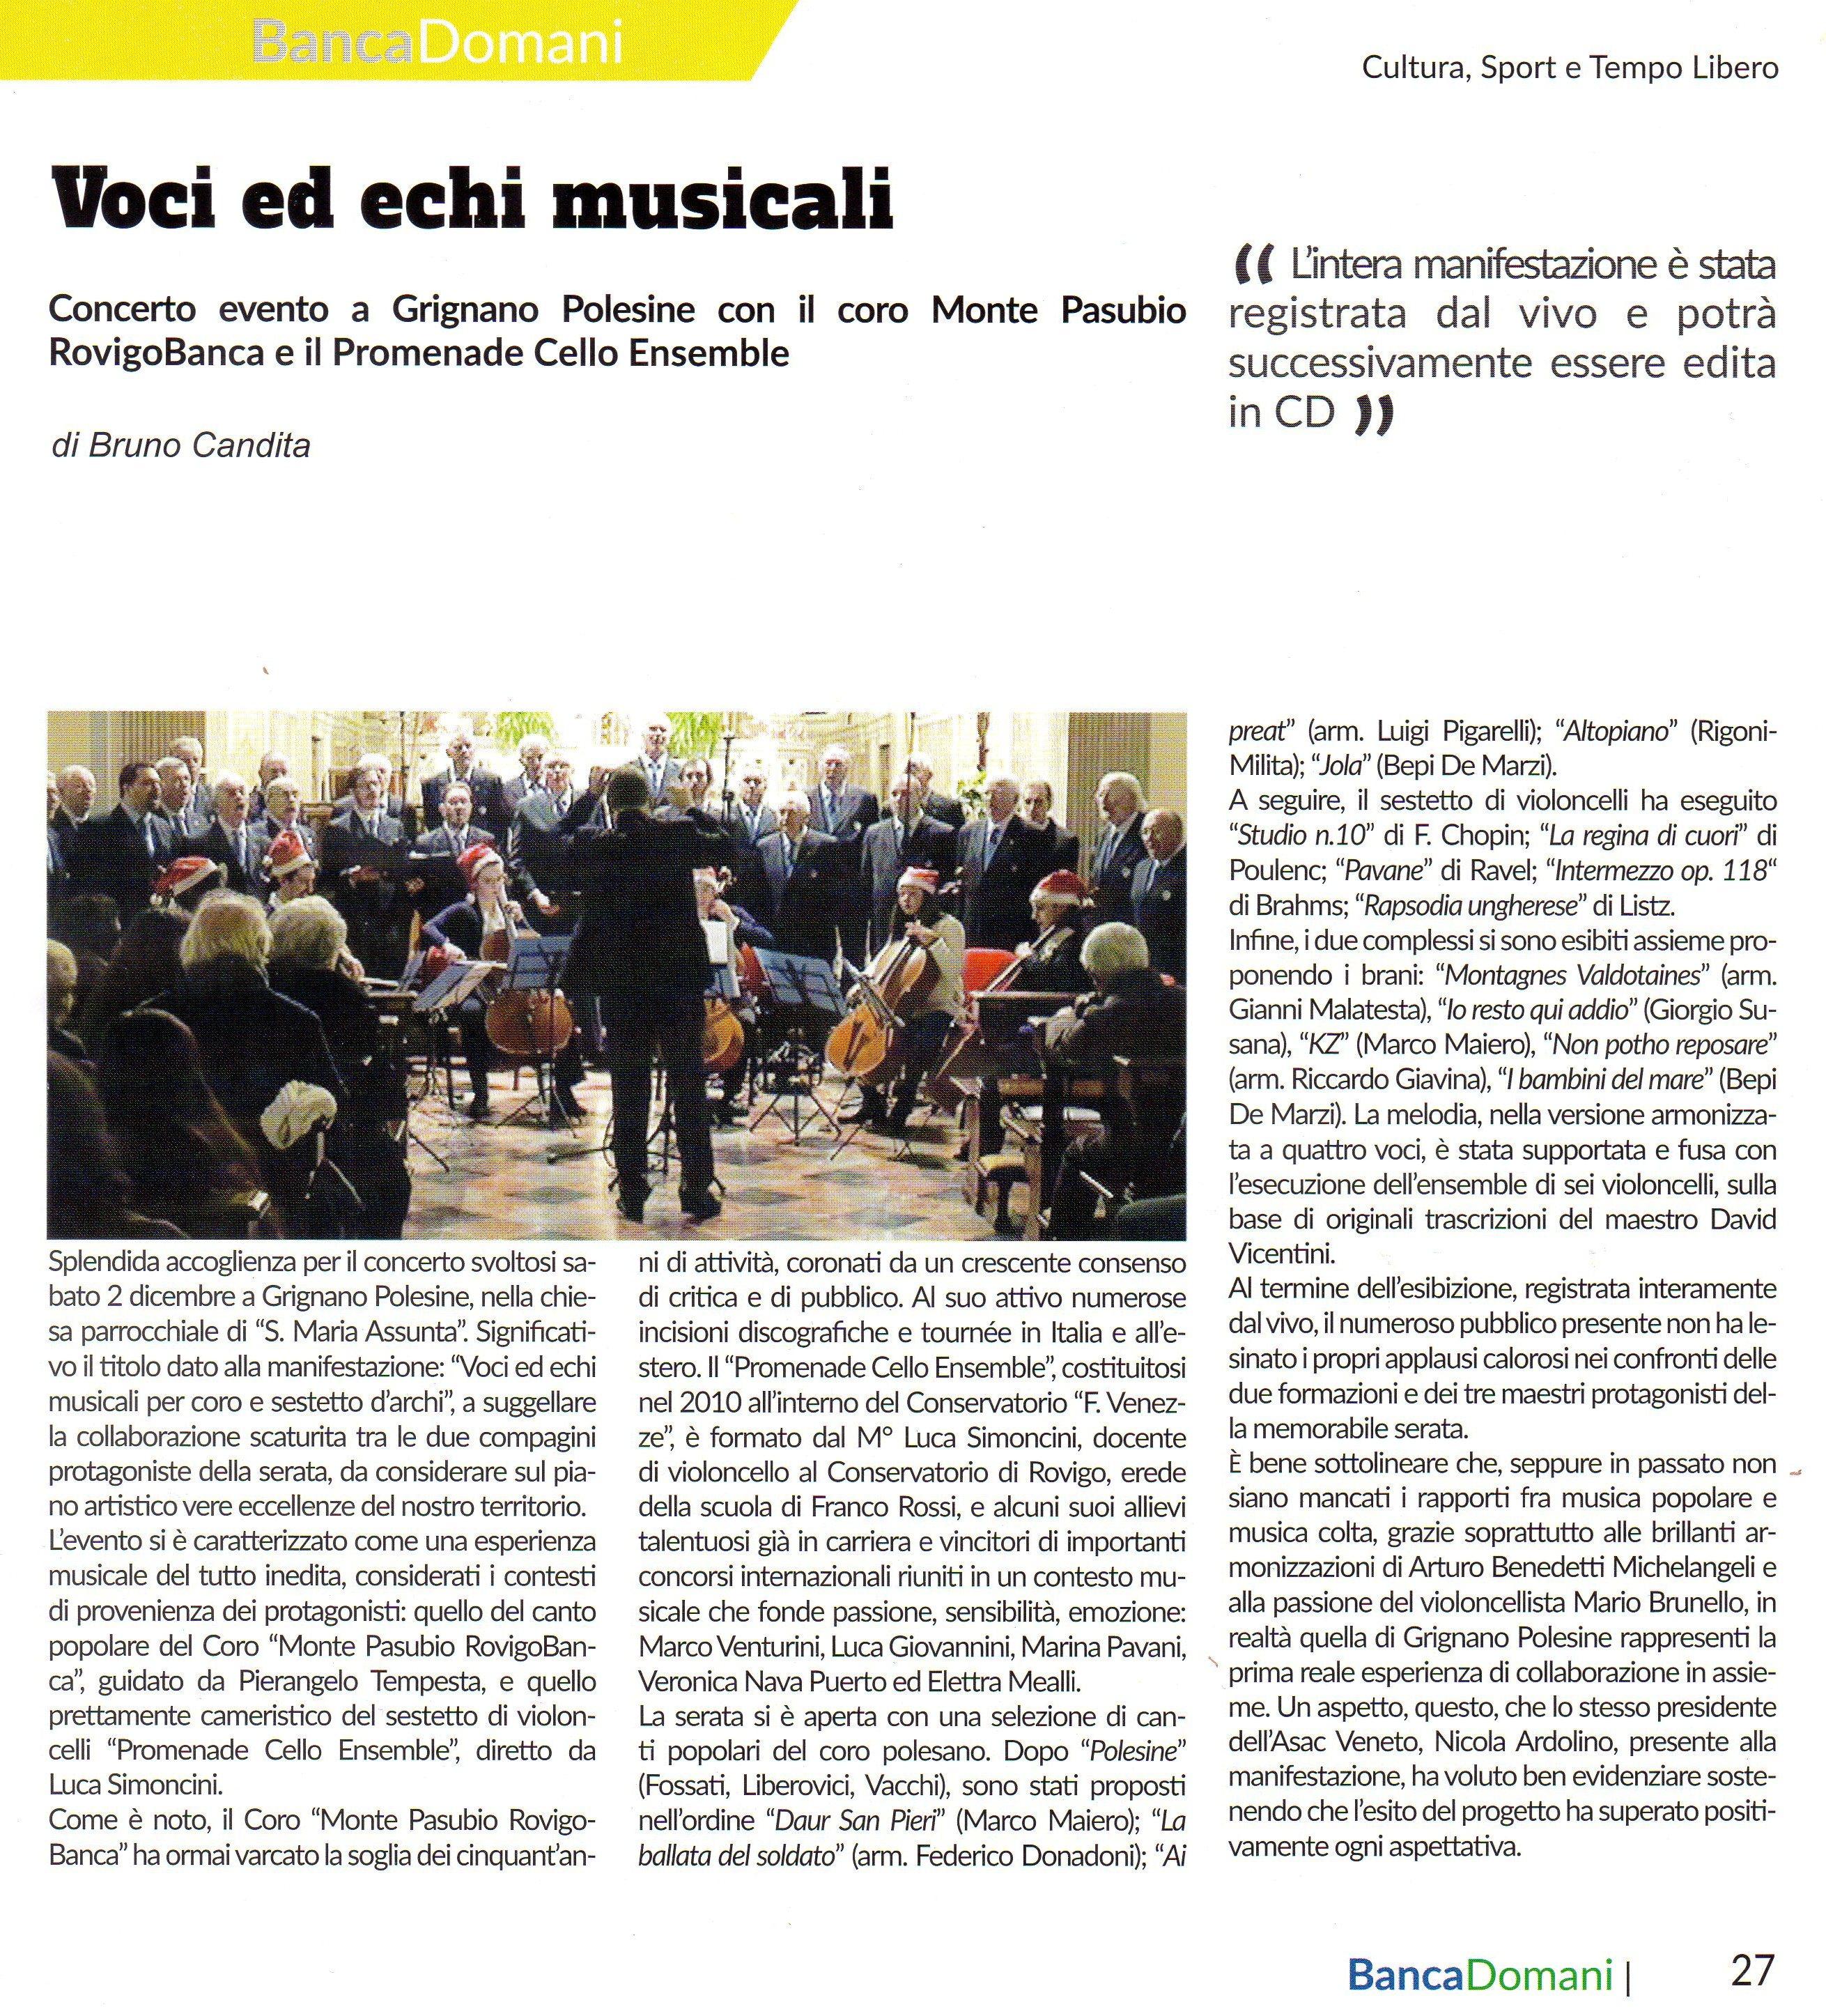 Voci ed Echi Musicali